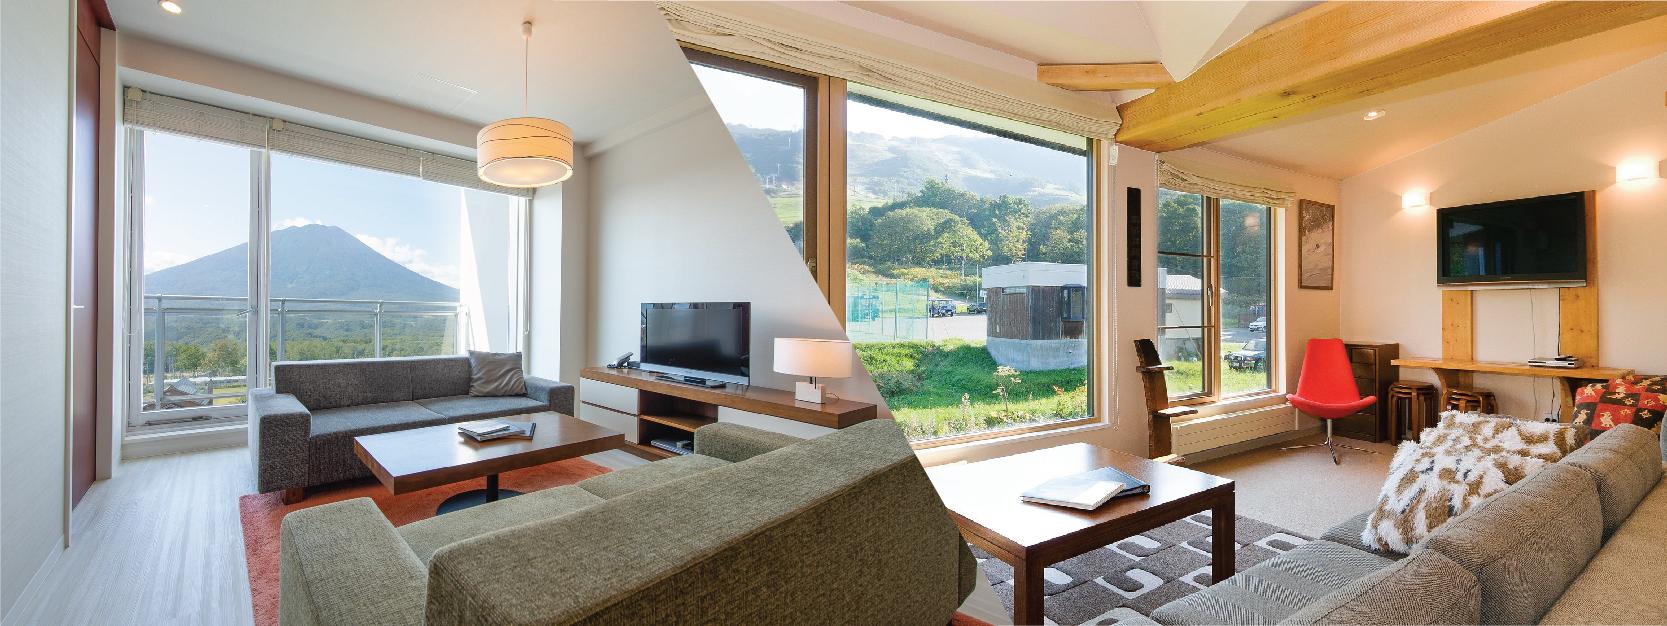 niseko landmark view and gondola chalets discounts for hanazono hill climb 2020